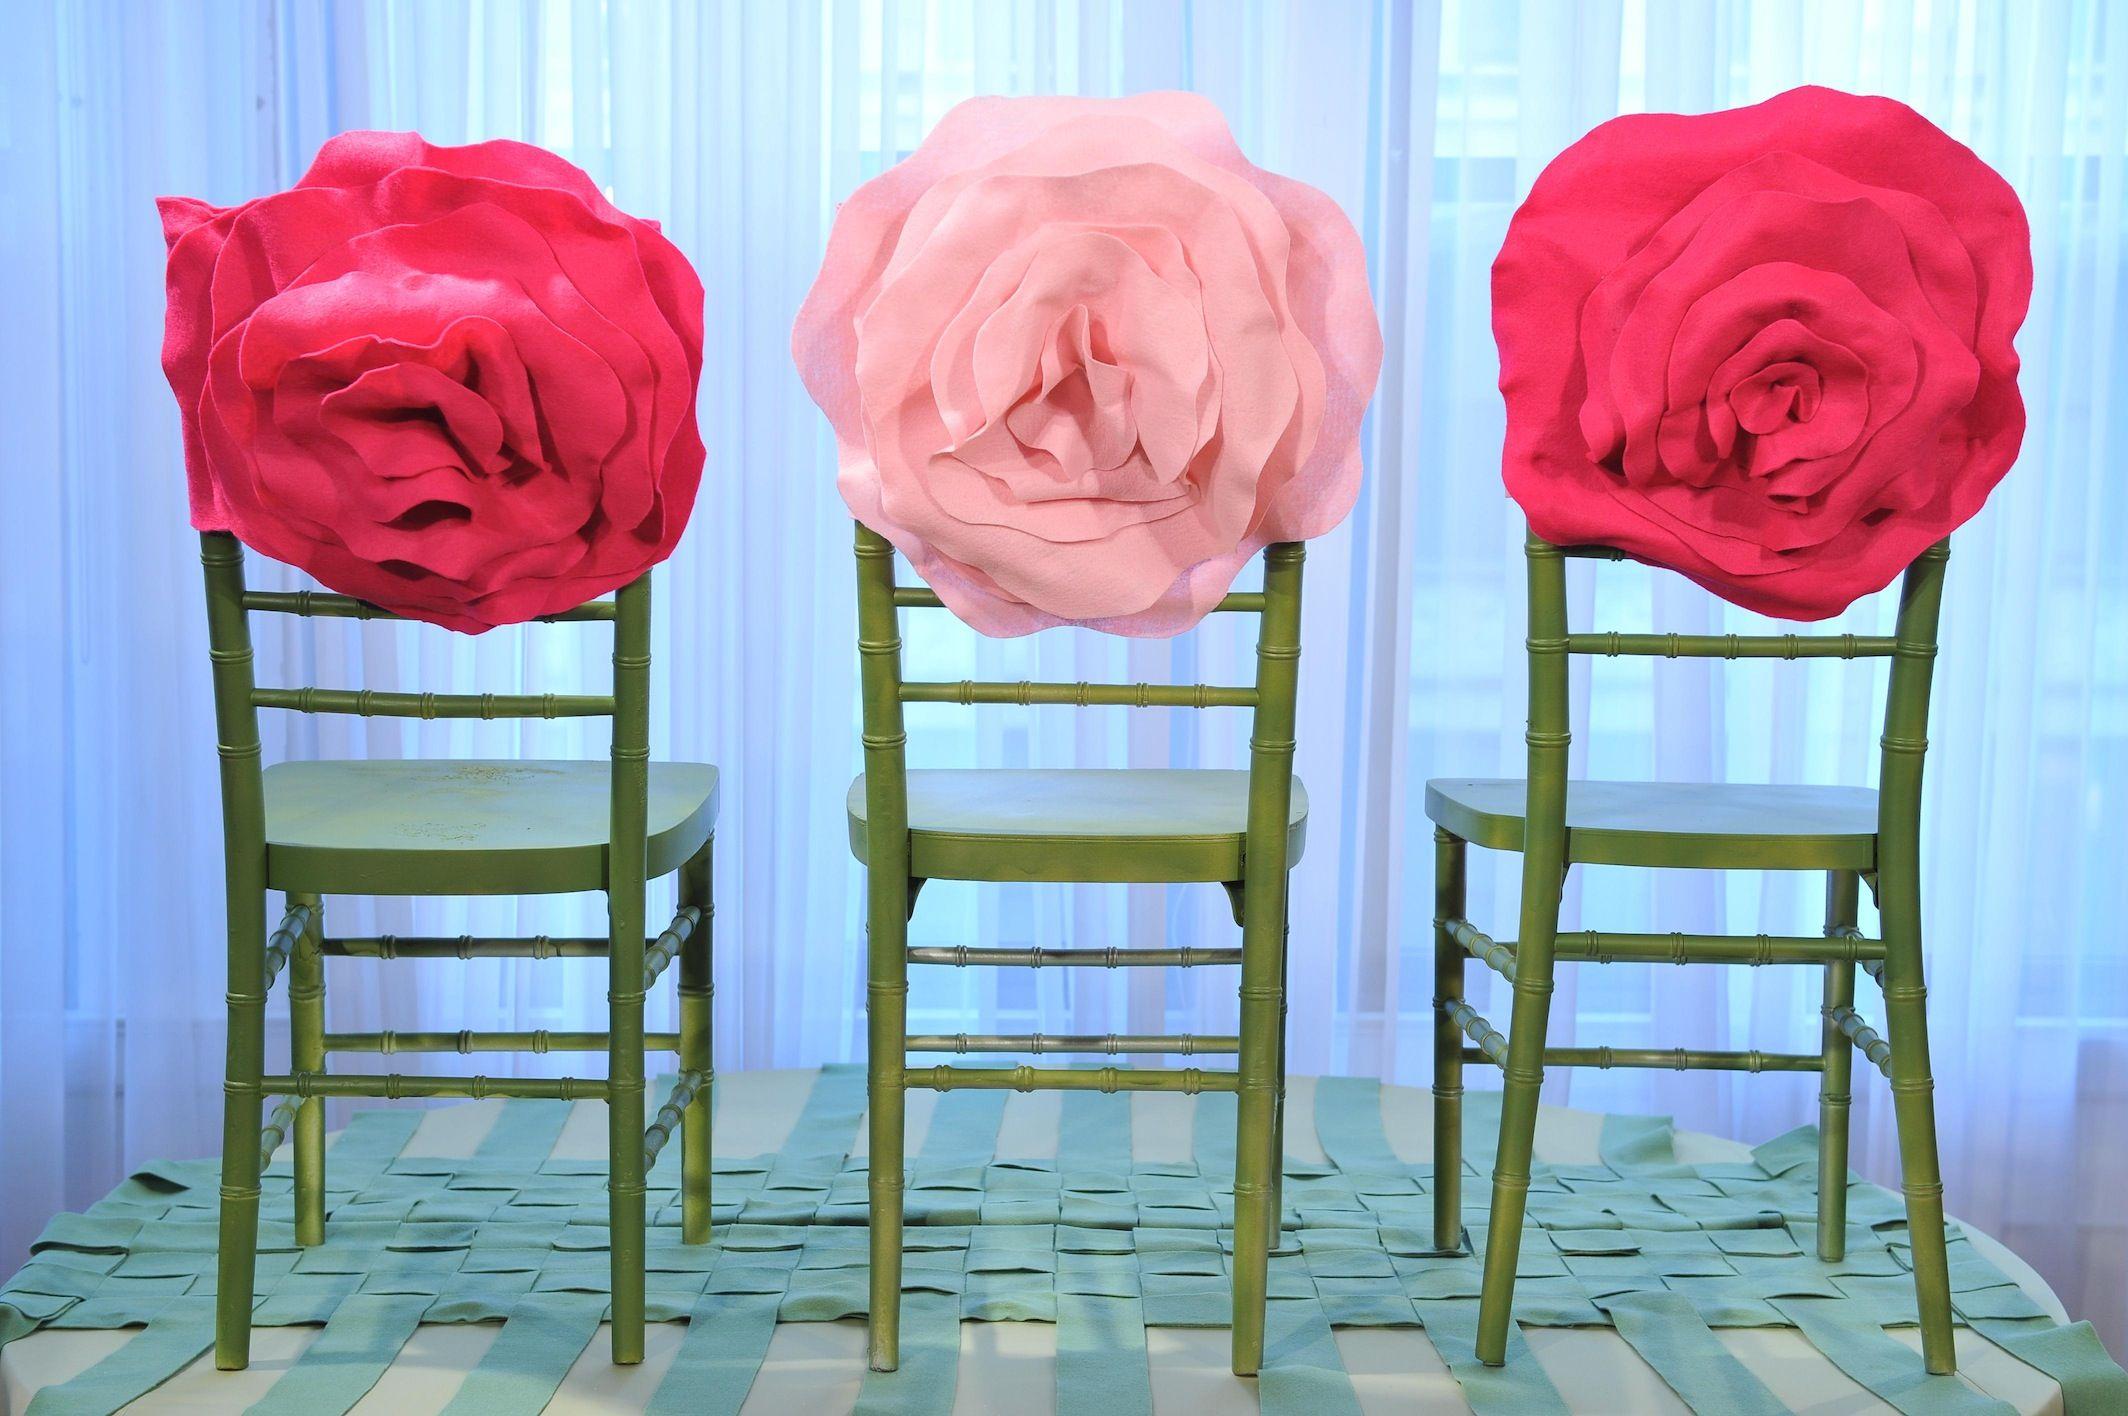 Wedding chair decorations diy  cool chair backs  Church Events  Pinterest  Chair covers Preston